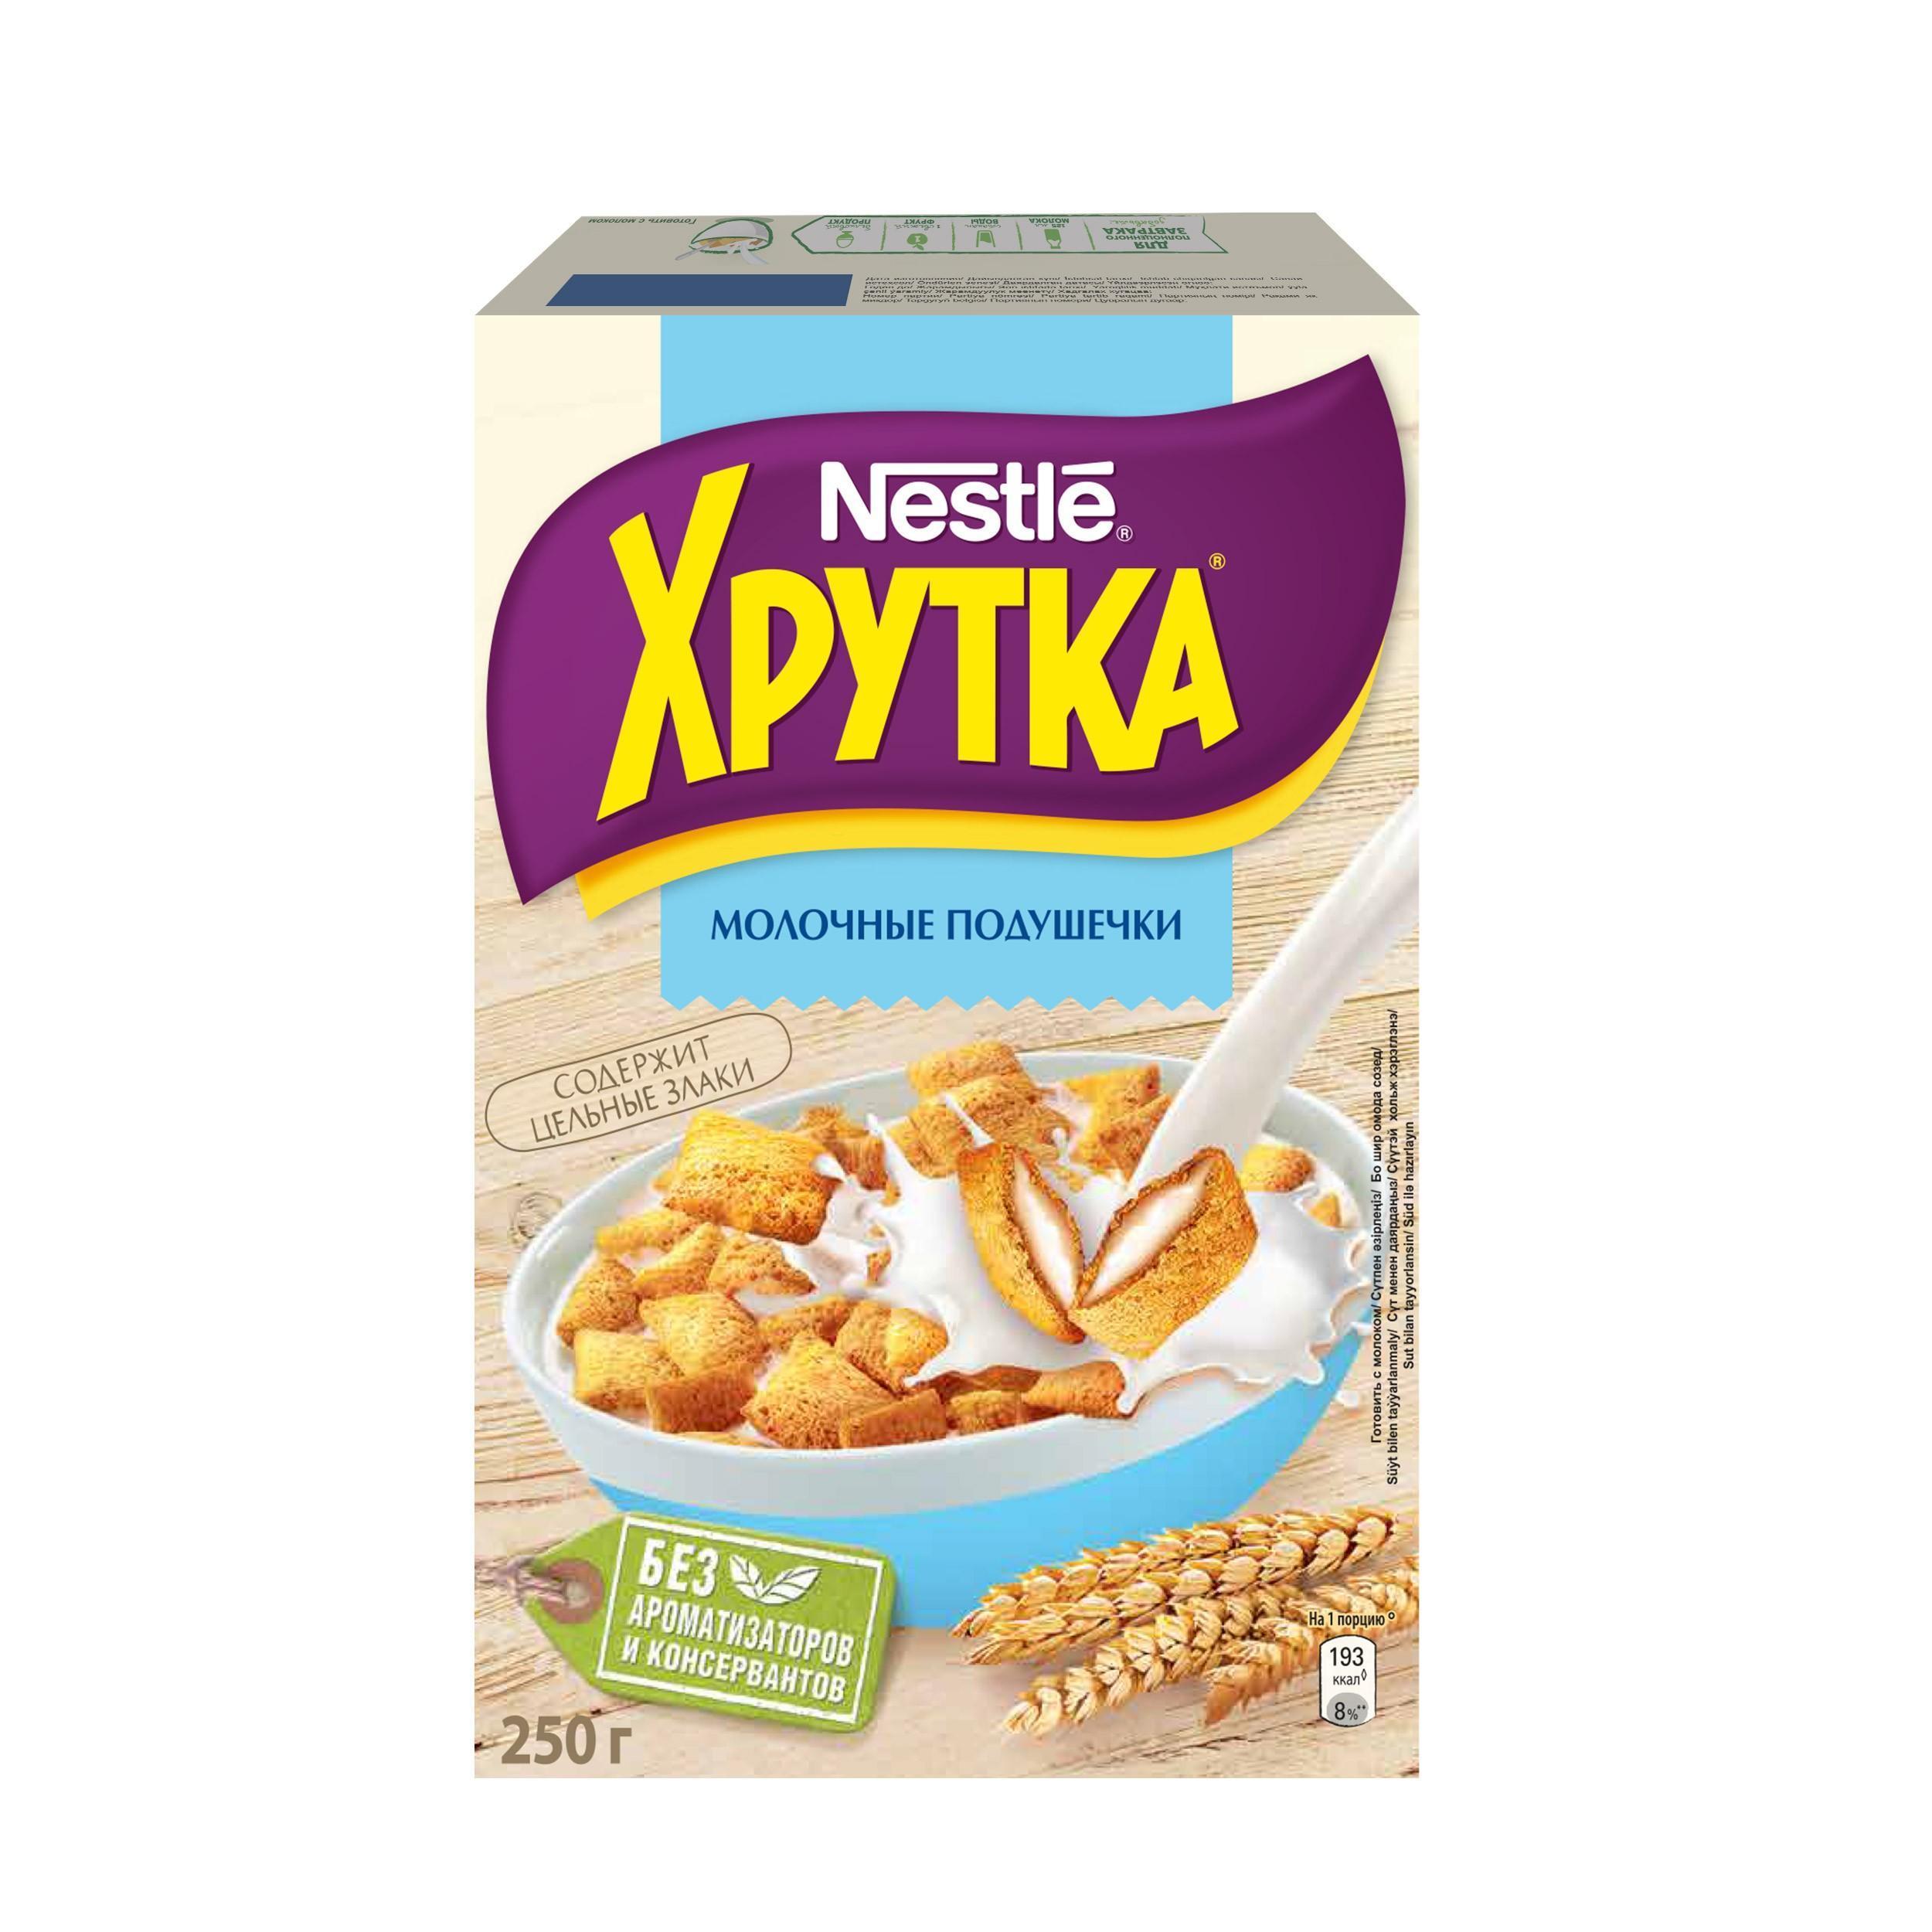 Готовый завтрак Хрутка Nestle молочные подушечки 250 г